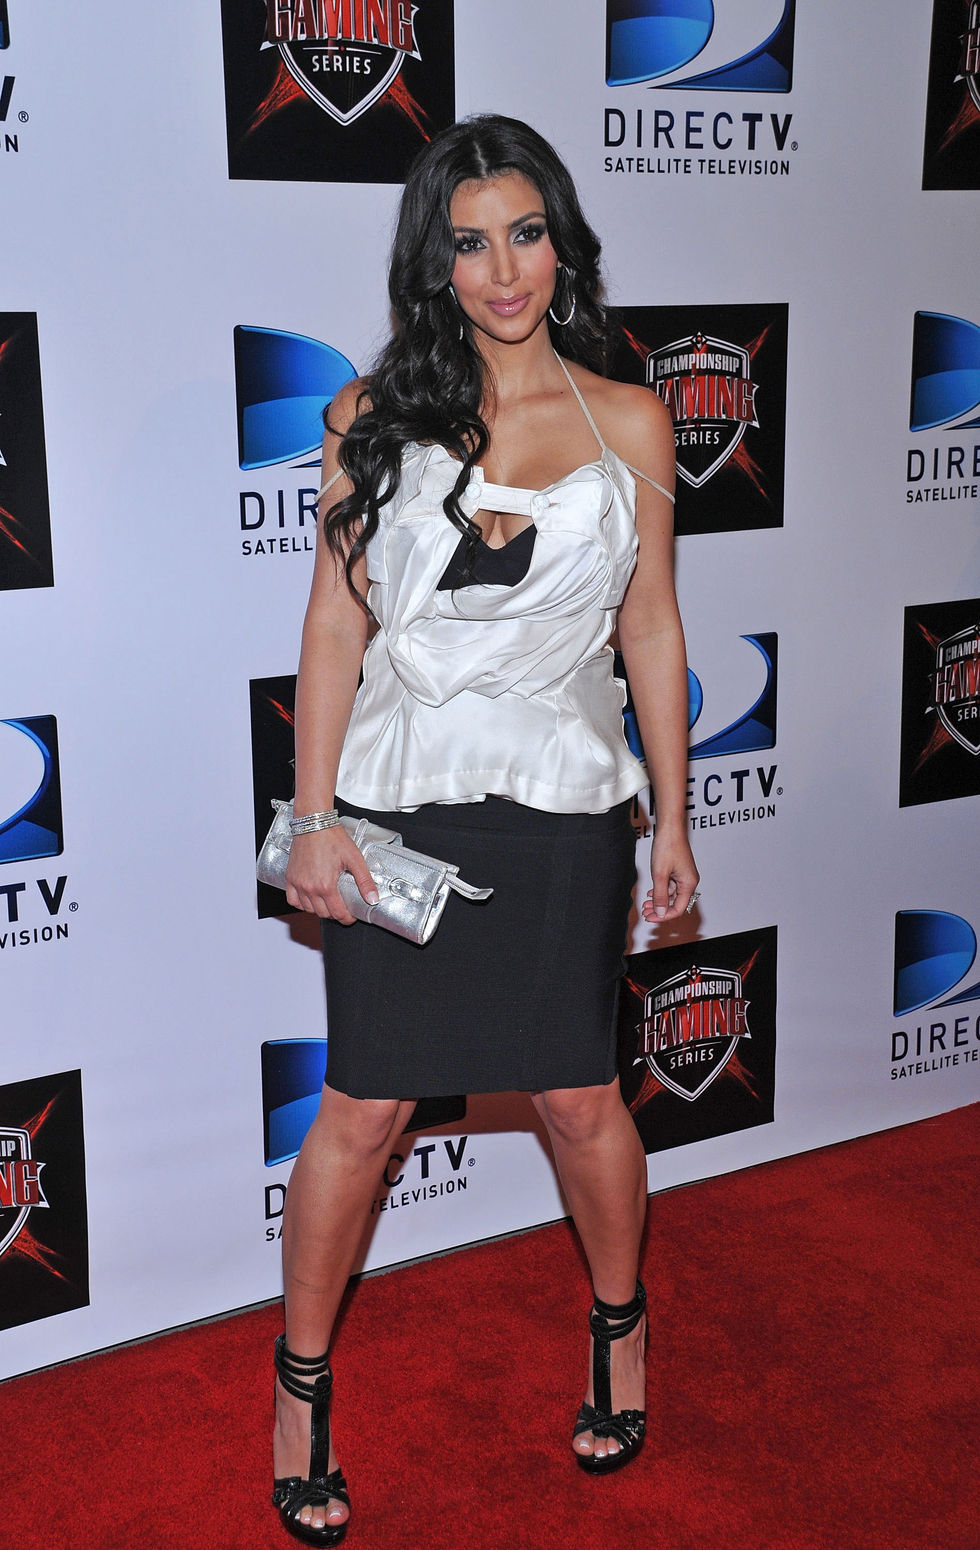 kim-kardashian-the-championship-gaming-series-kick-off-party-01